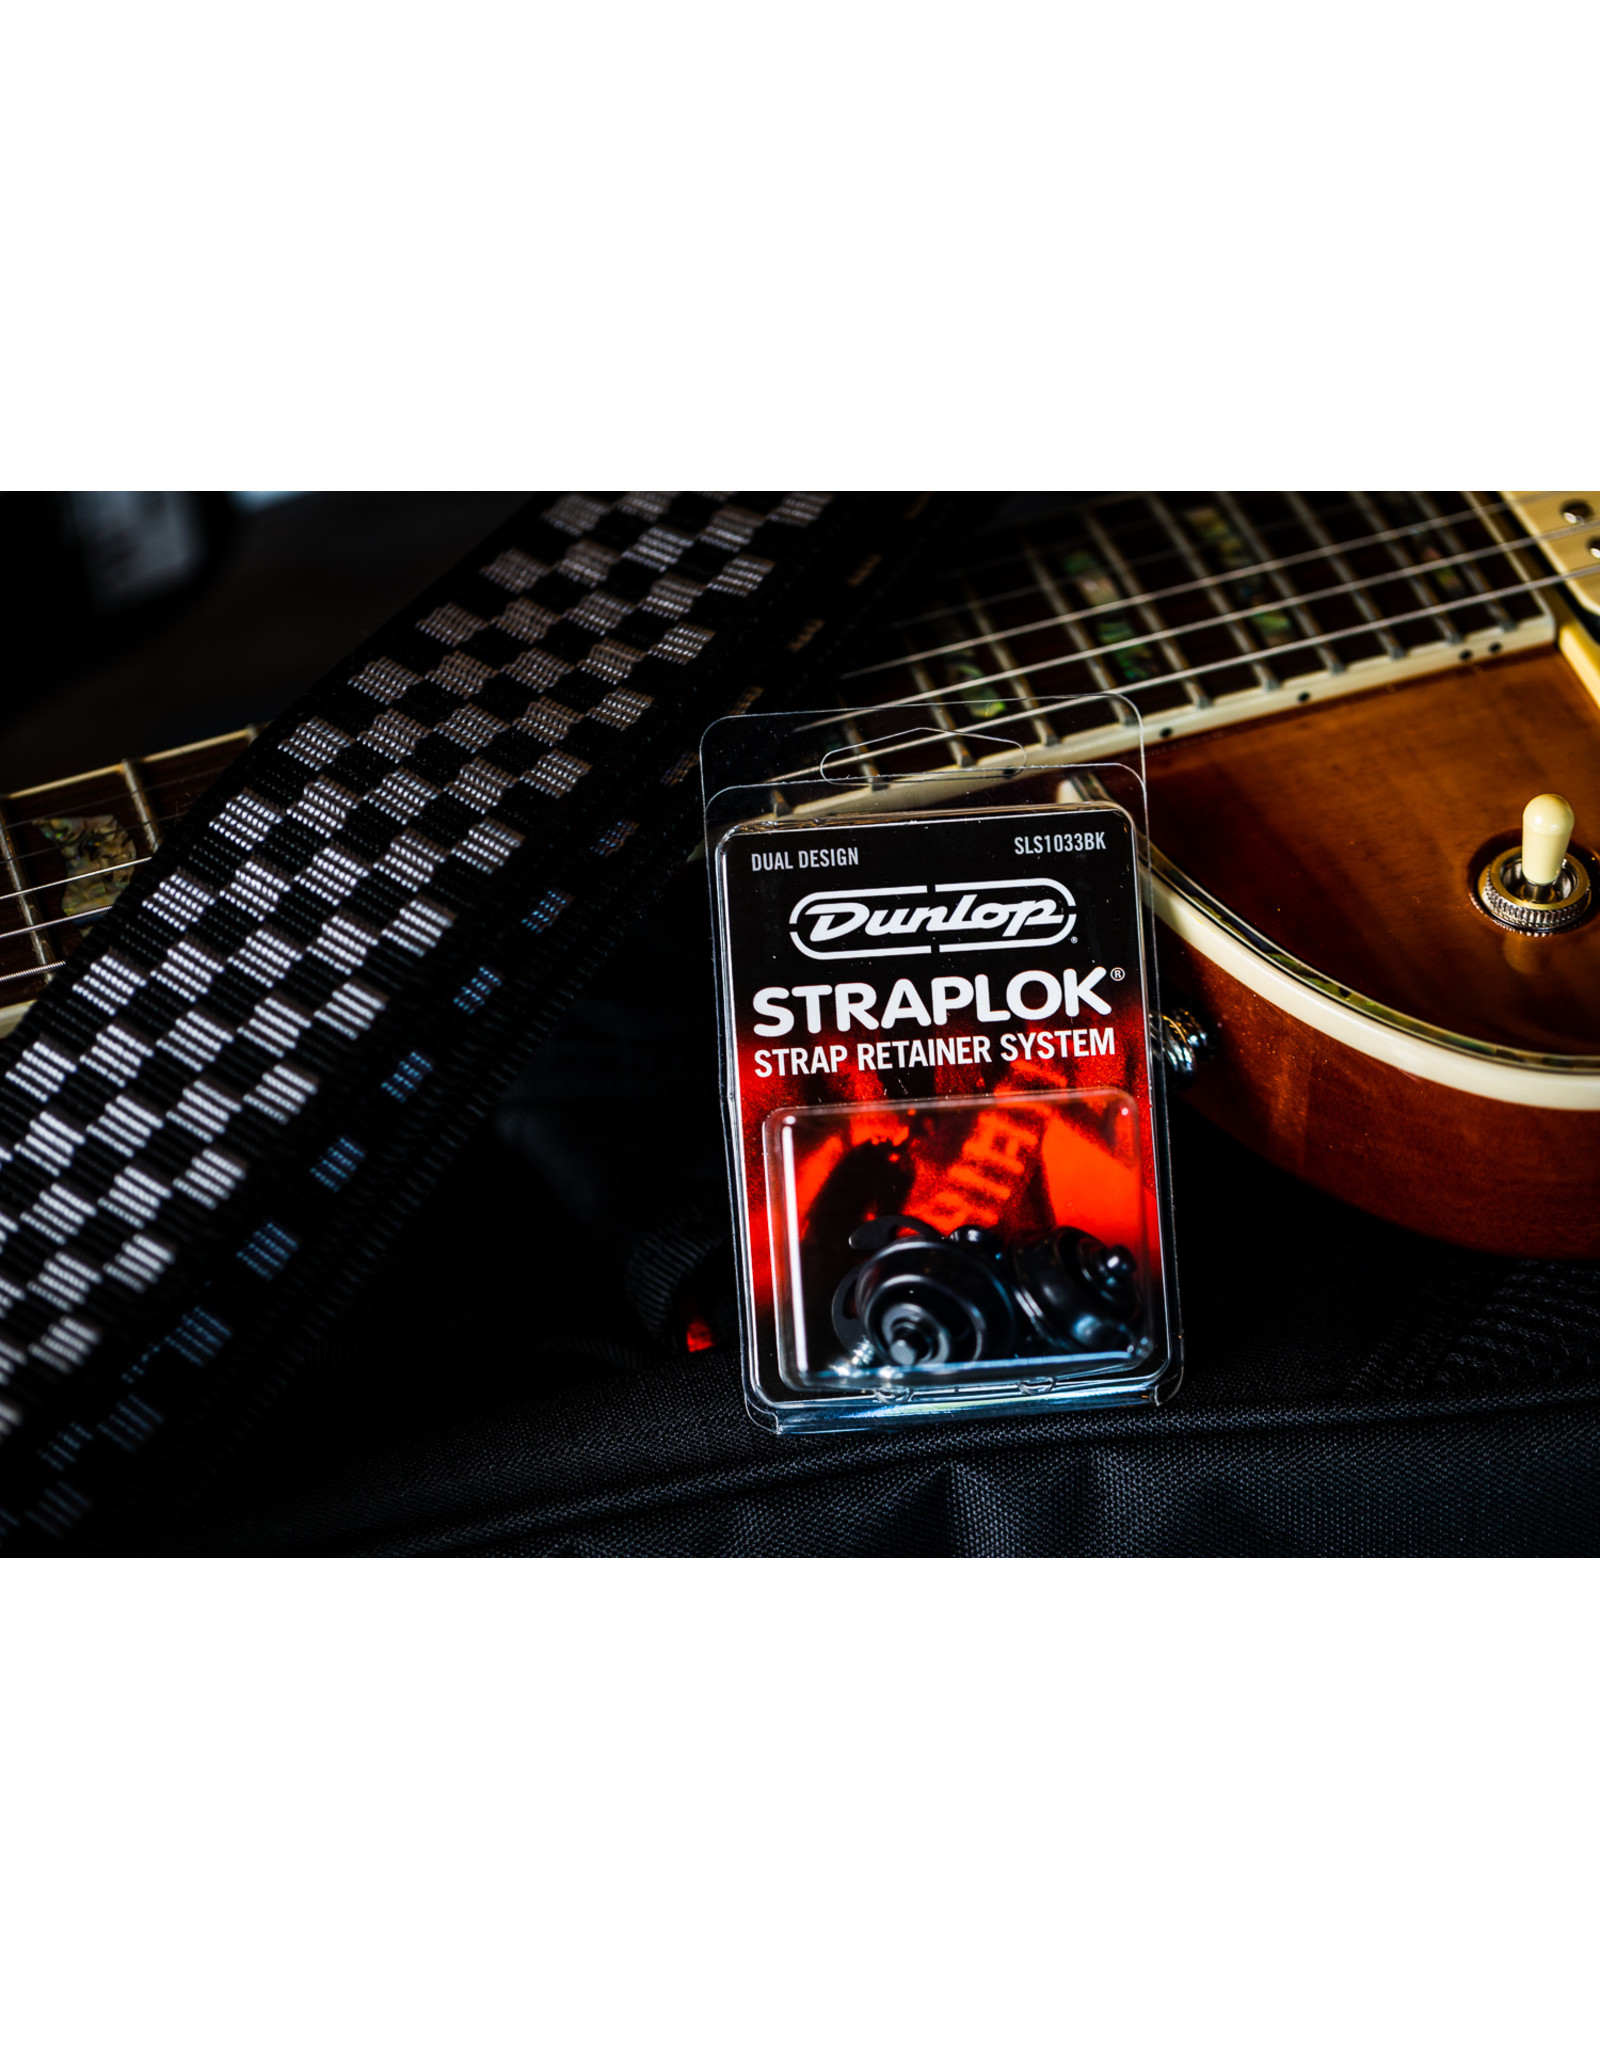 Dunlop STRAPLOK Strap Retainers Dual Design - BLACK OXIDE